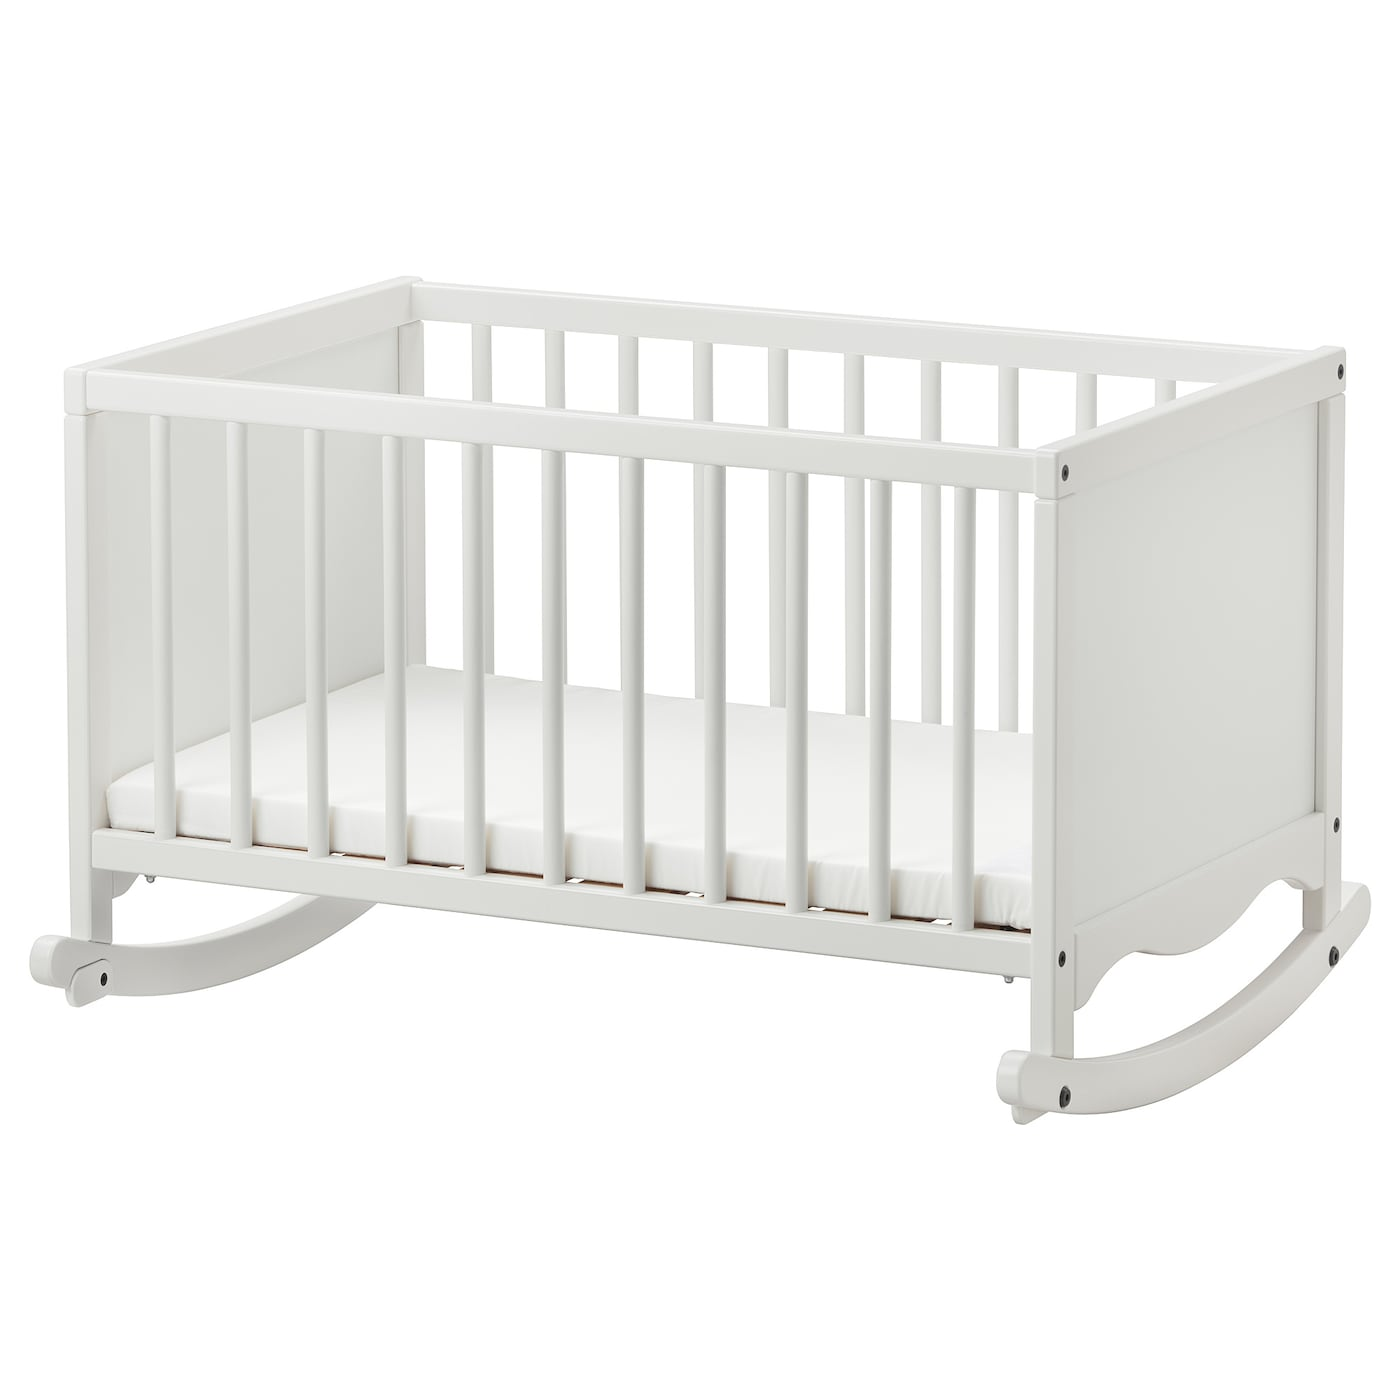 Solgul Cradle With Sleeping Pad White 26x33 1 8 Ikea